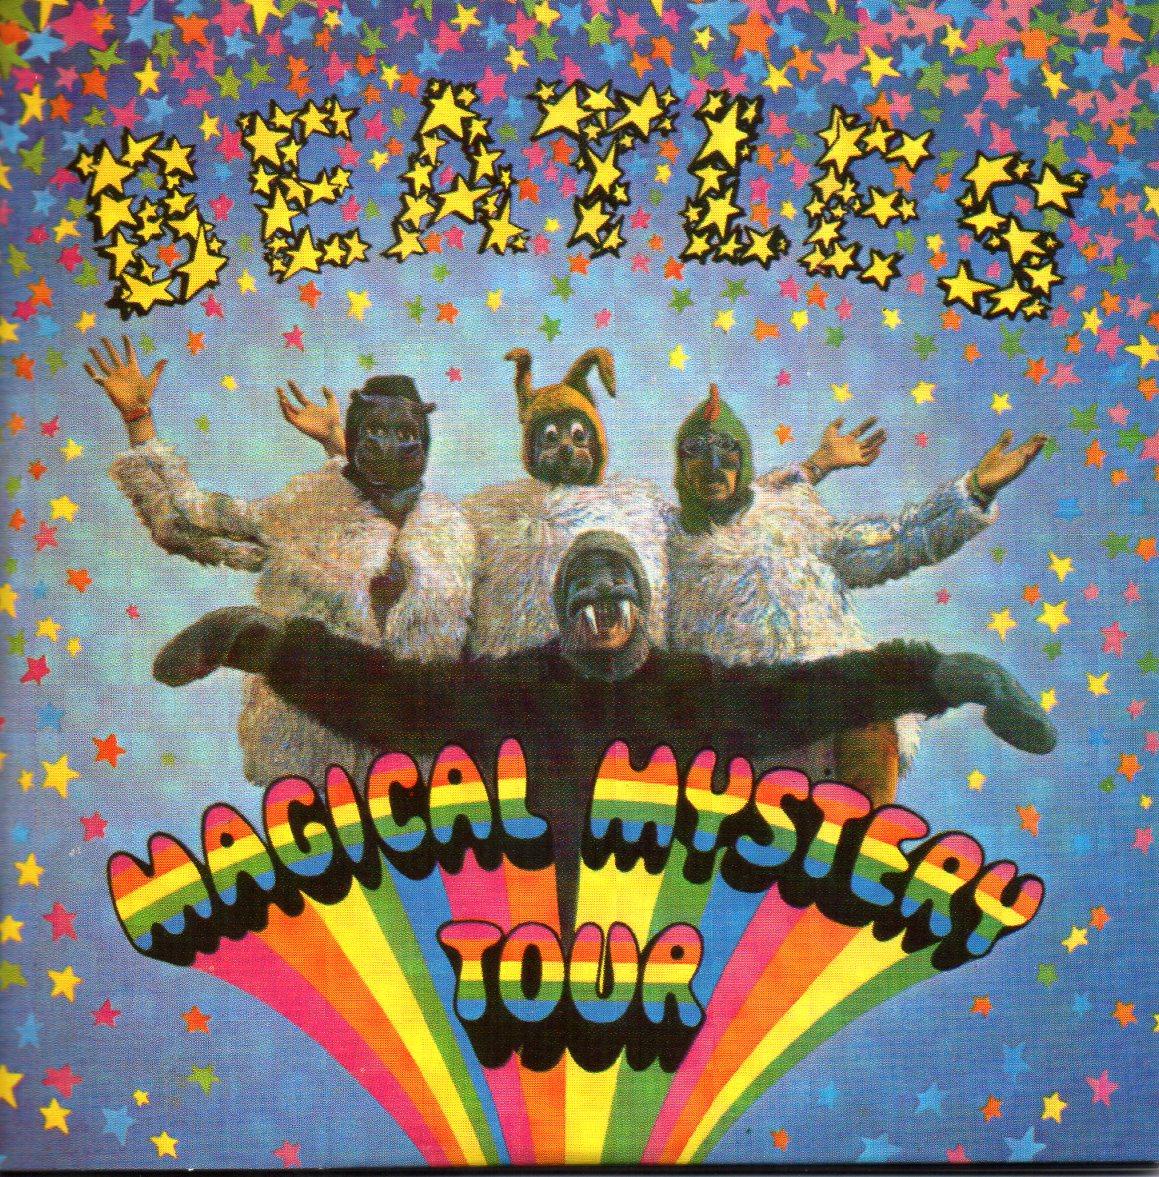 THE BEATLES - Magical mystery tour EP - 2 X 6-TRACK Leaflet sleeve 2 CD singles - CD x 2